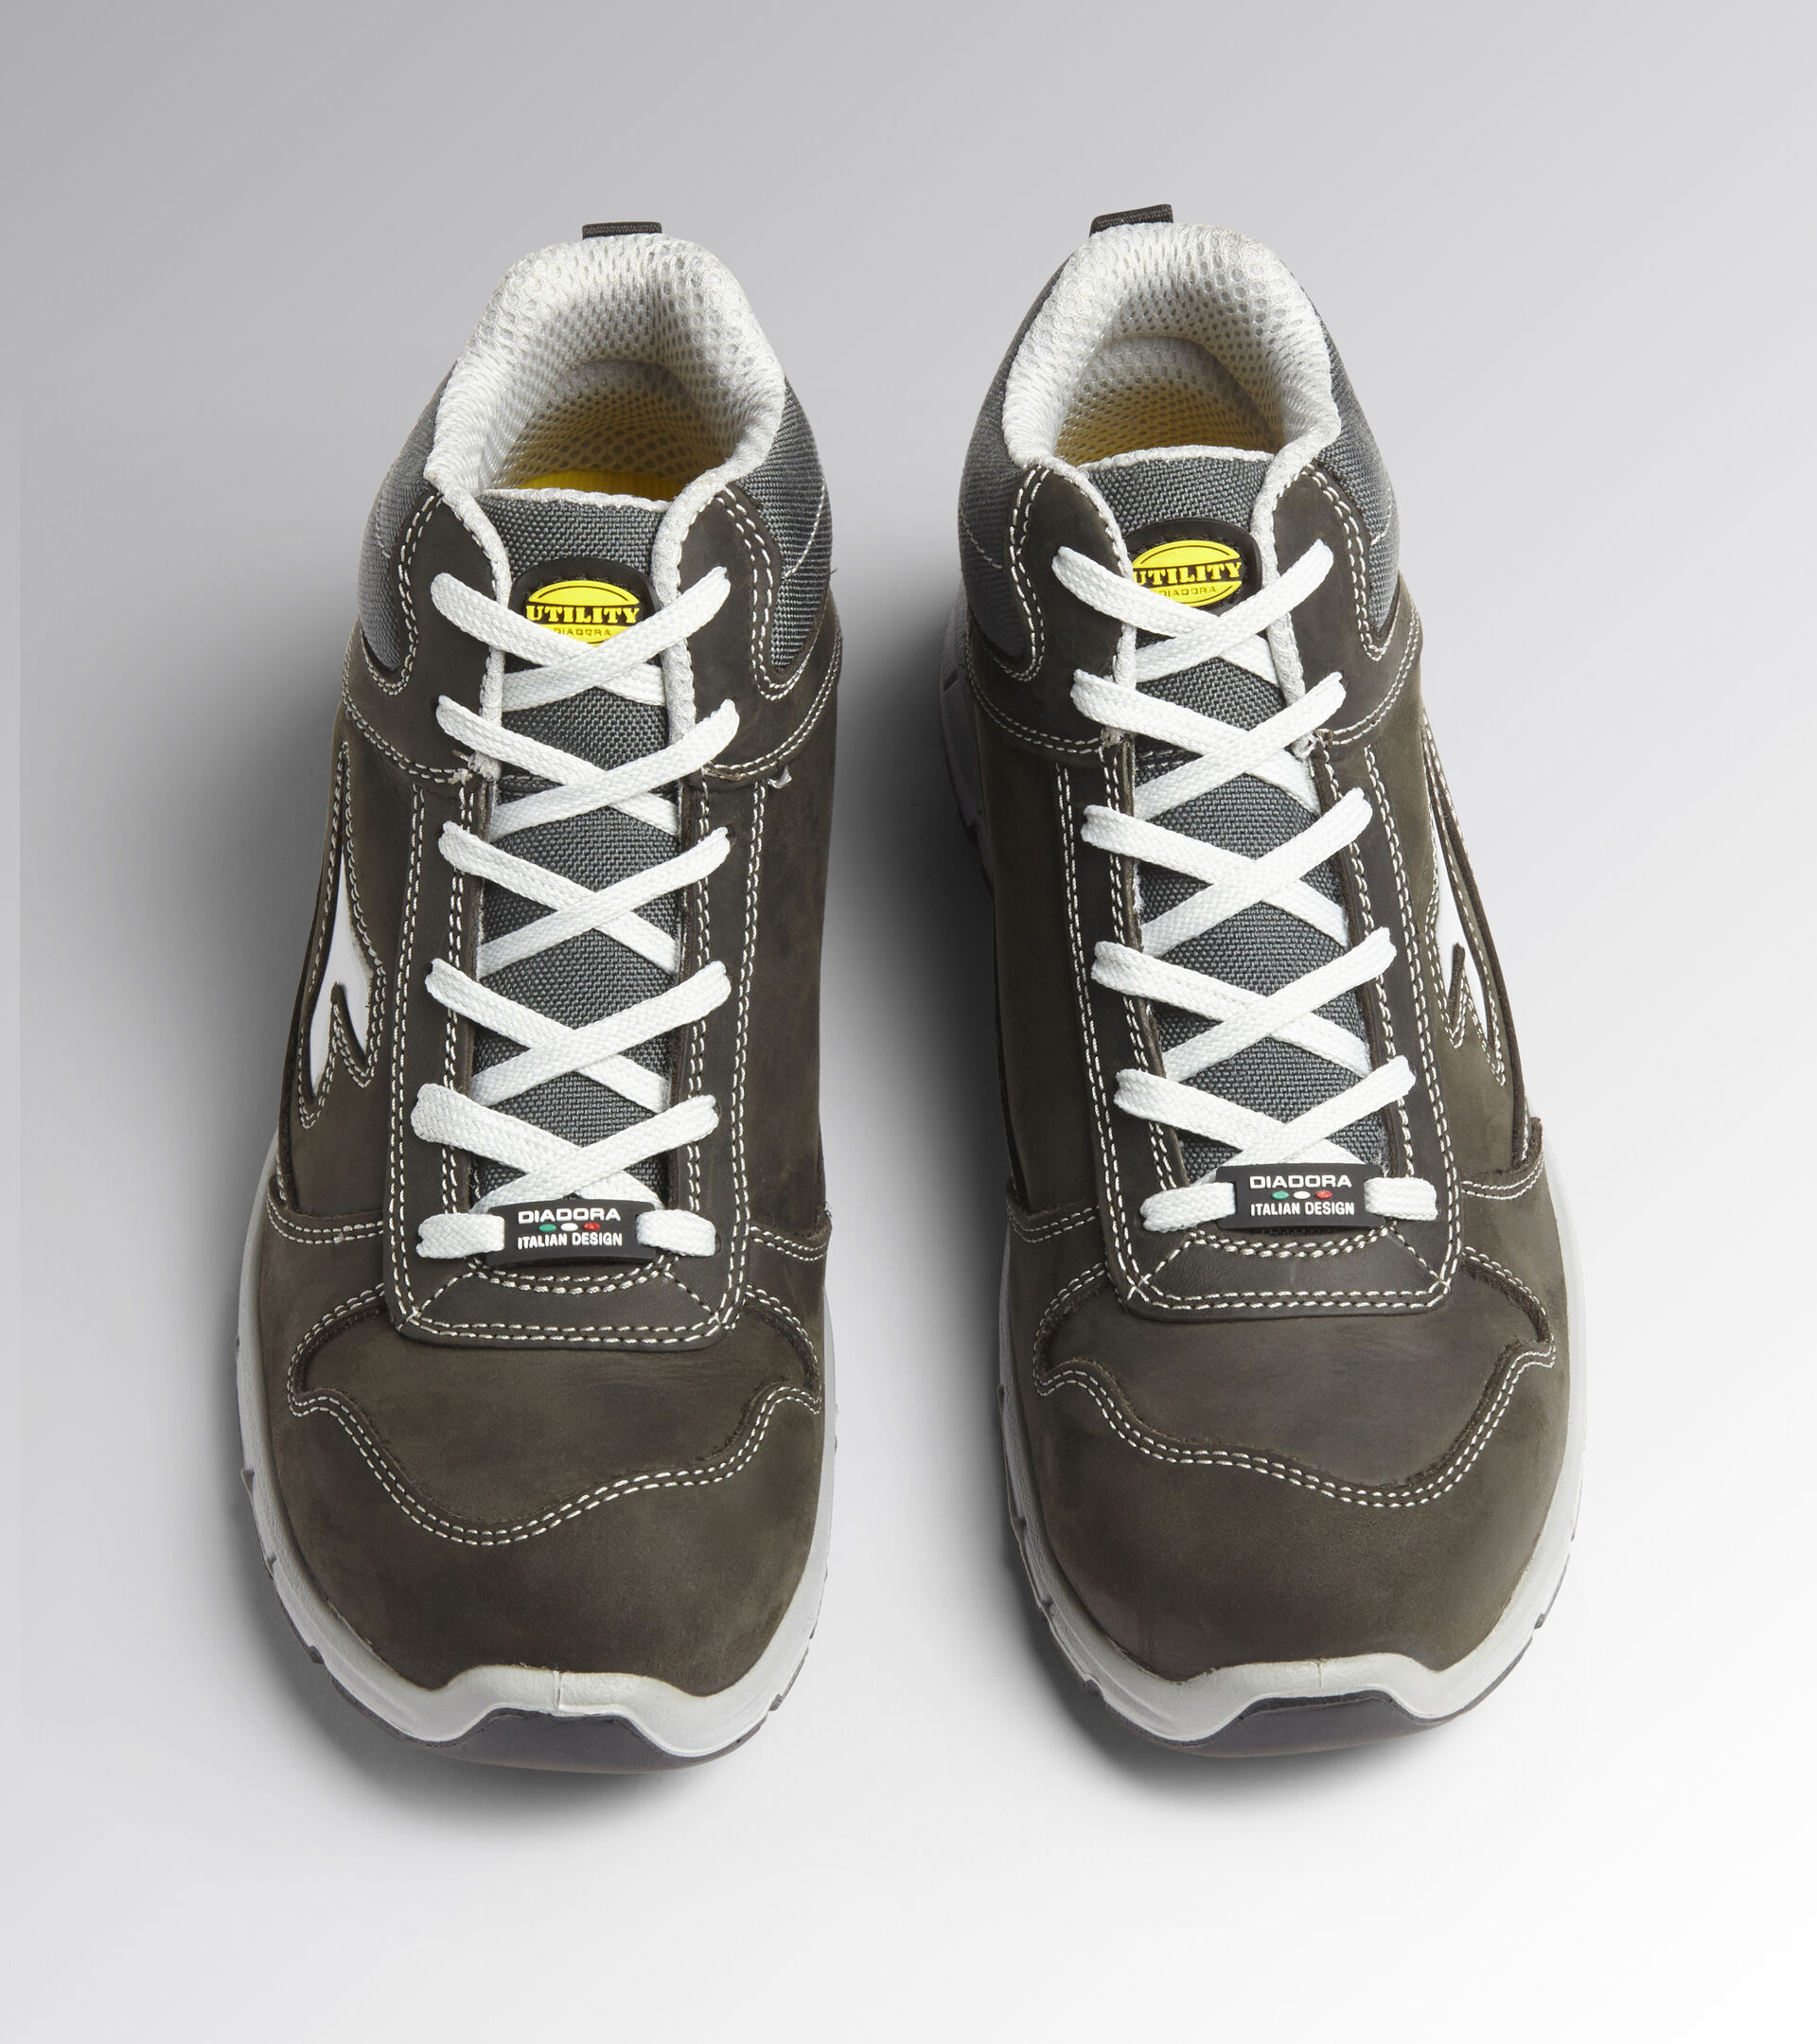 Footwear Utility UNISEX RUN G MID S3 SRC SCHLOSSSTEIN Utility